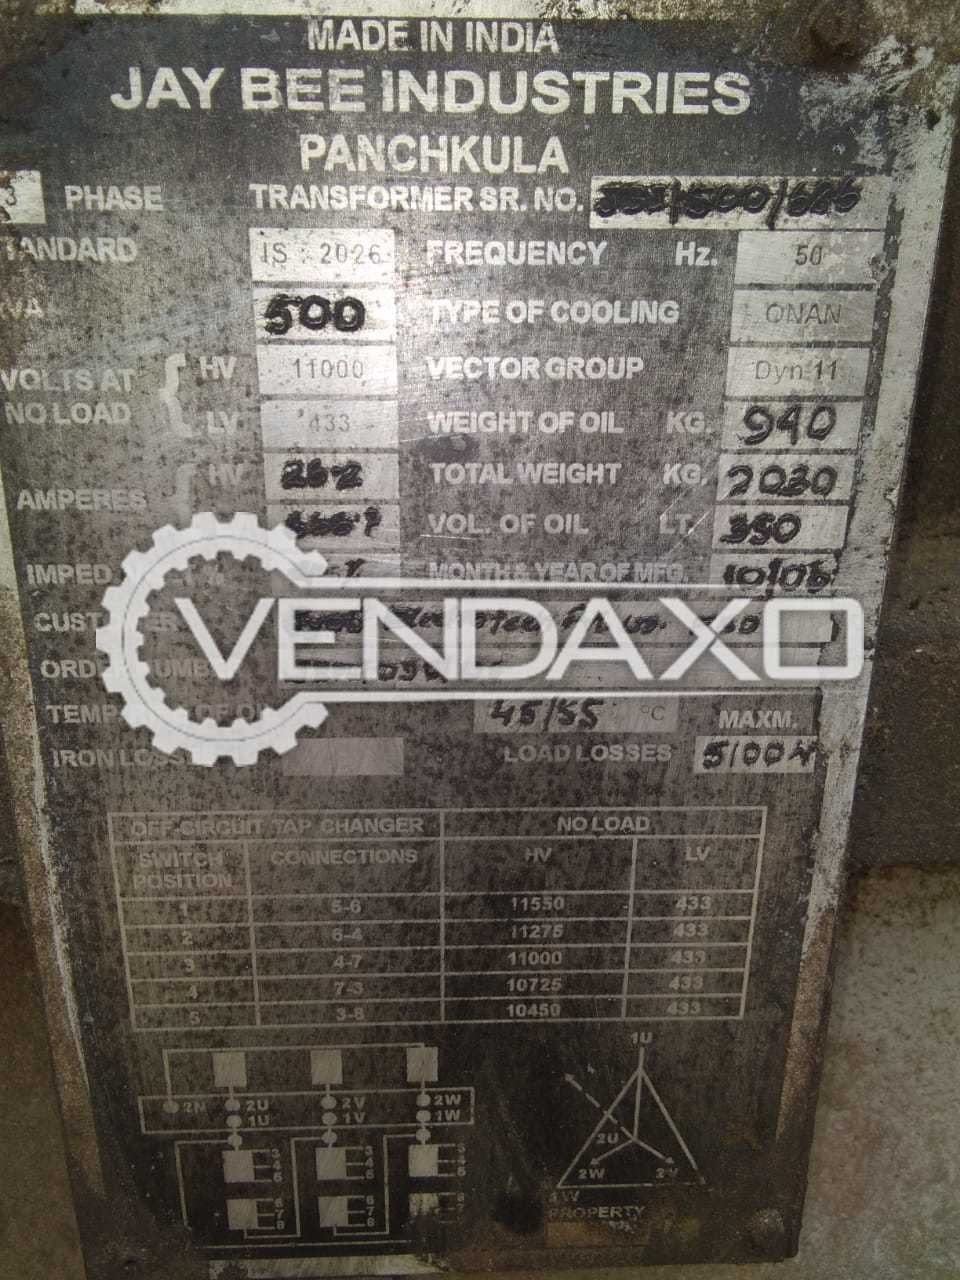 Jay Bee Industries Make Transformer - 500 Kva